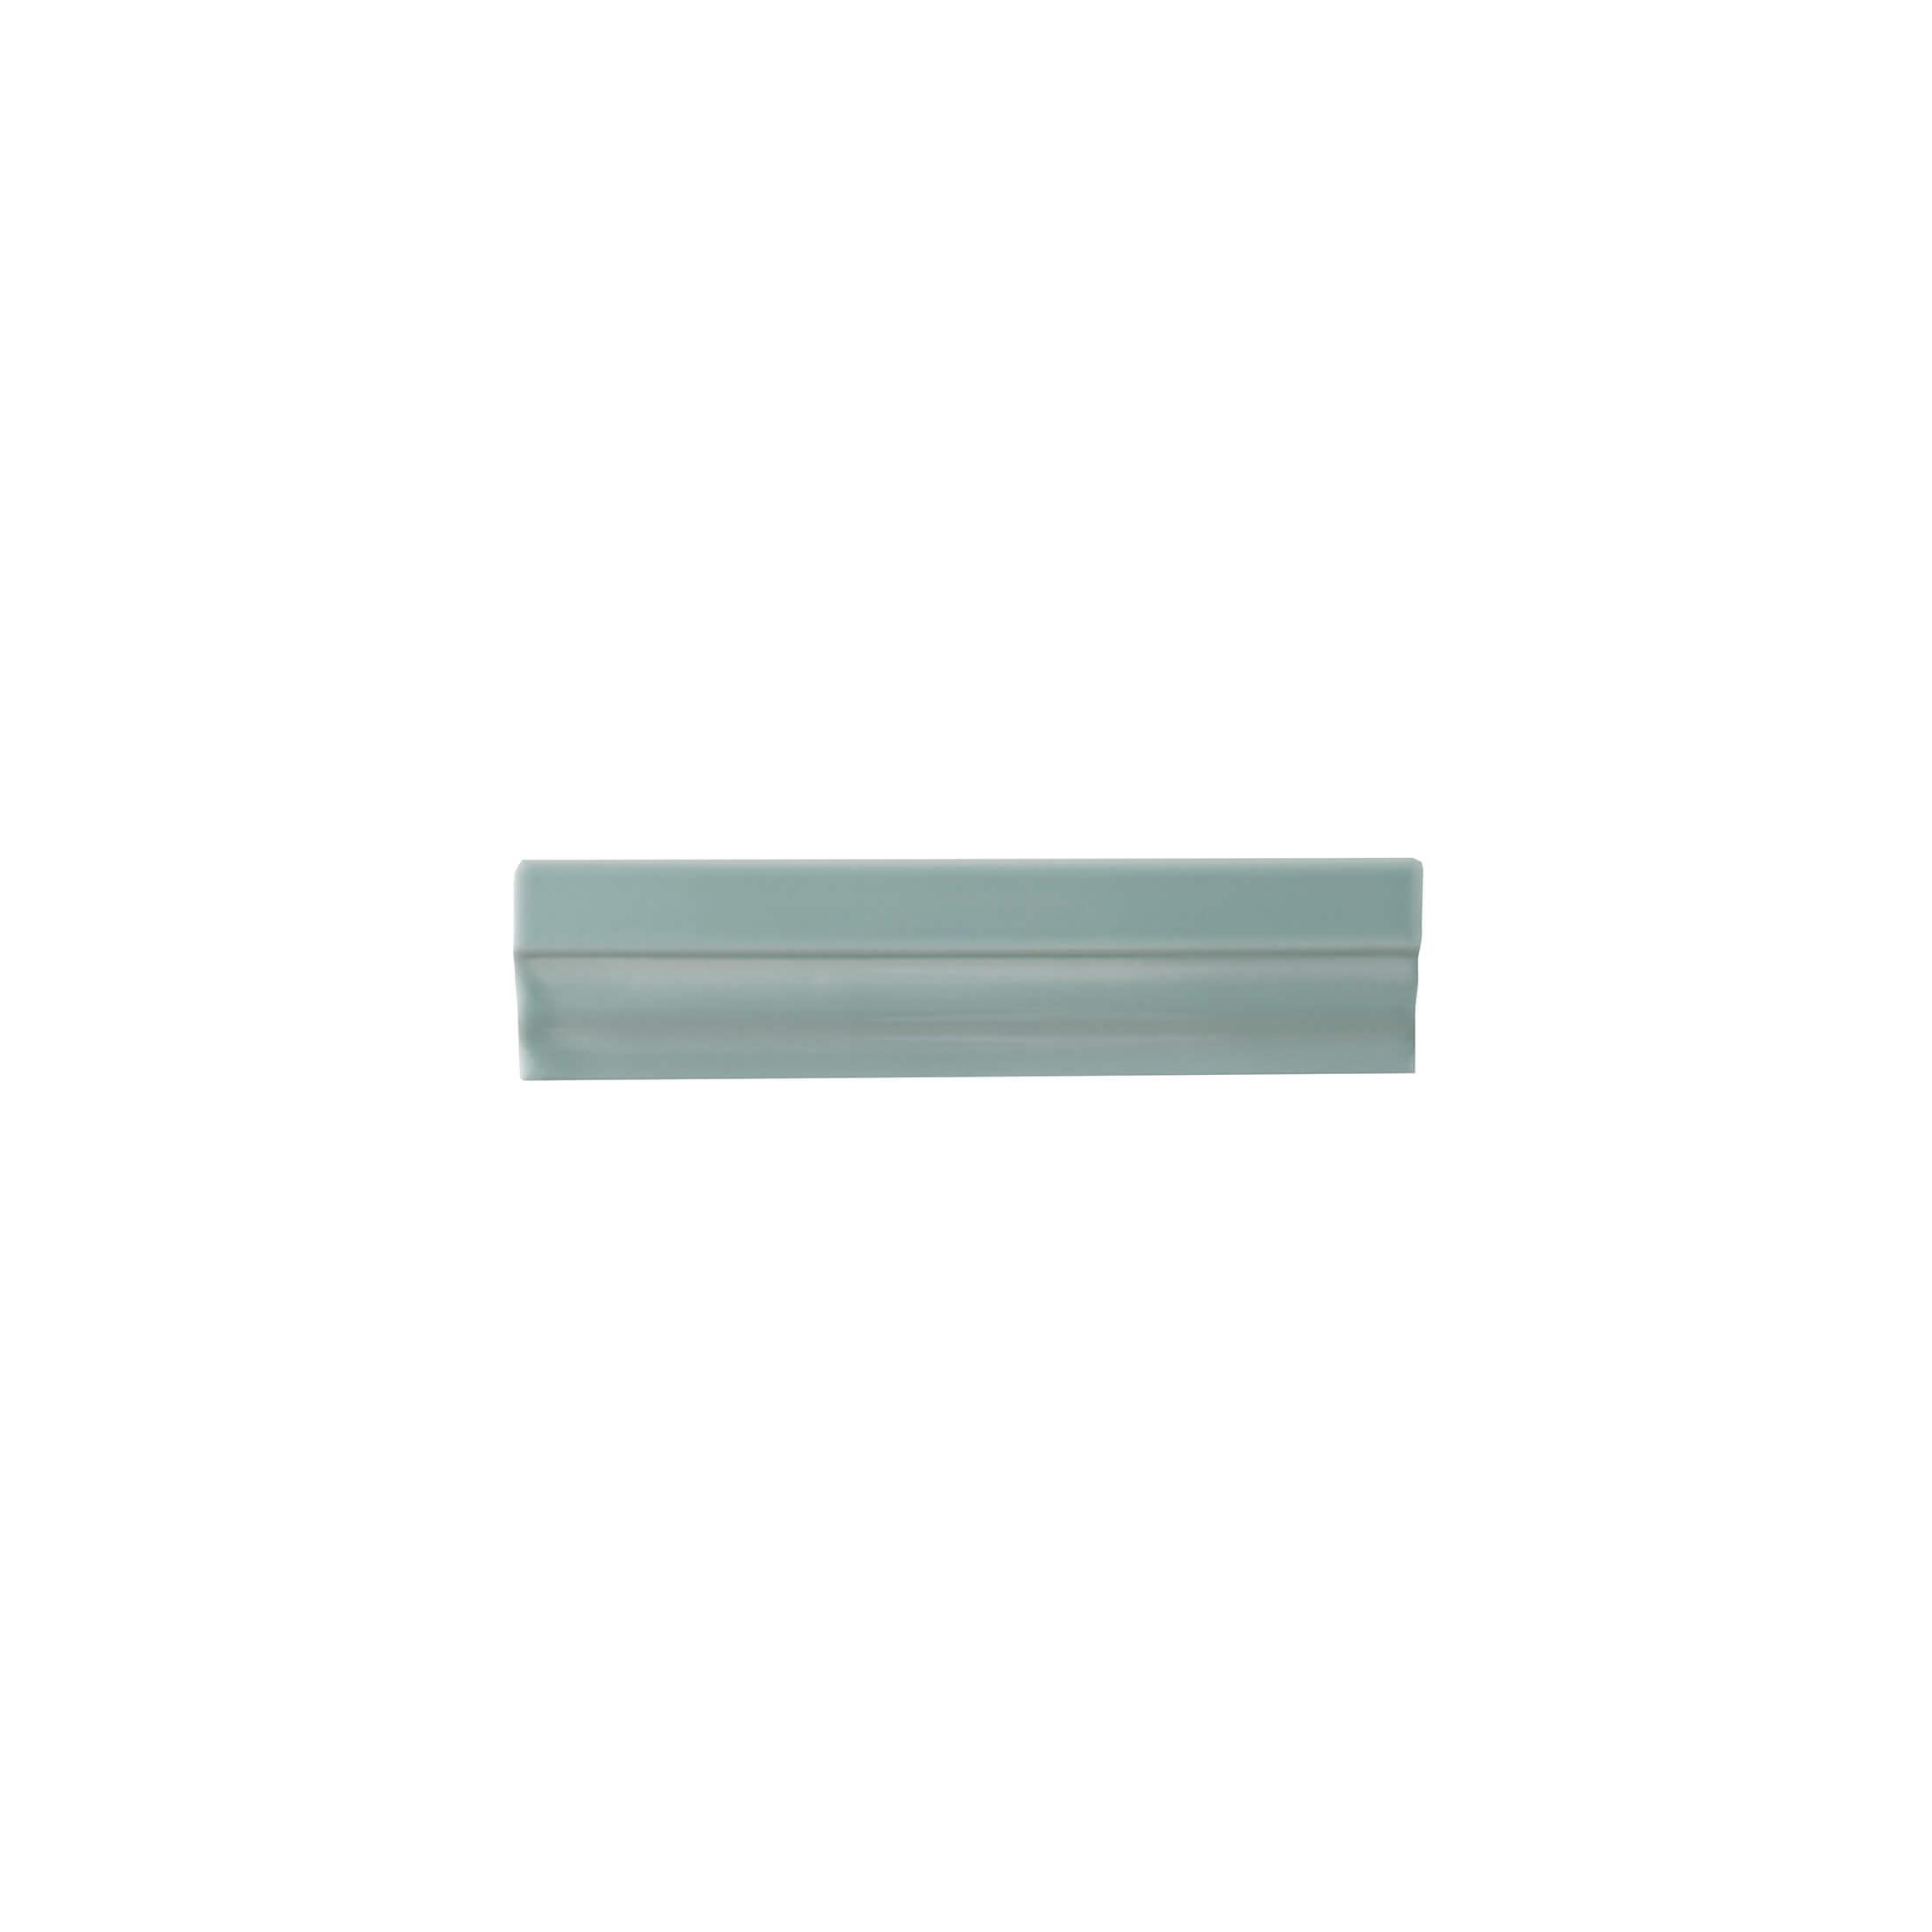 ADNE5624 - CORNISA CLASICA - 3,5 cm X 15 cm